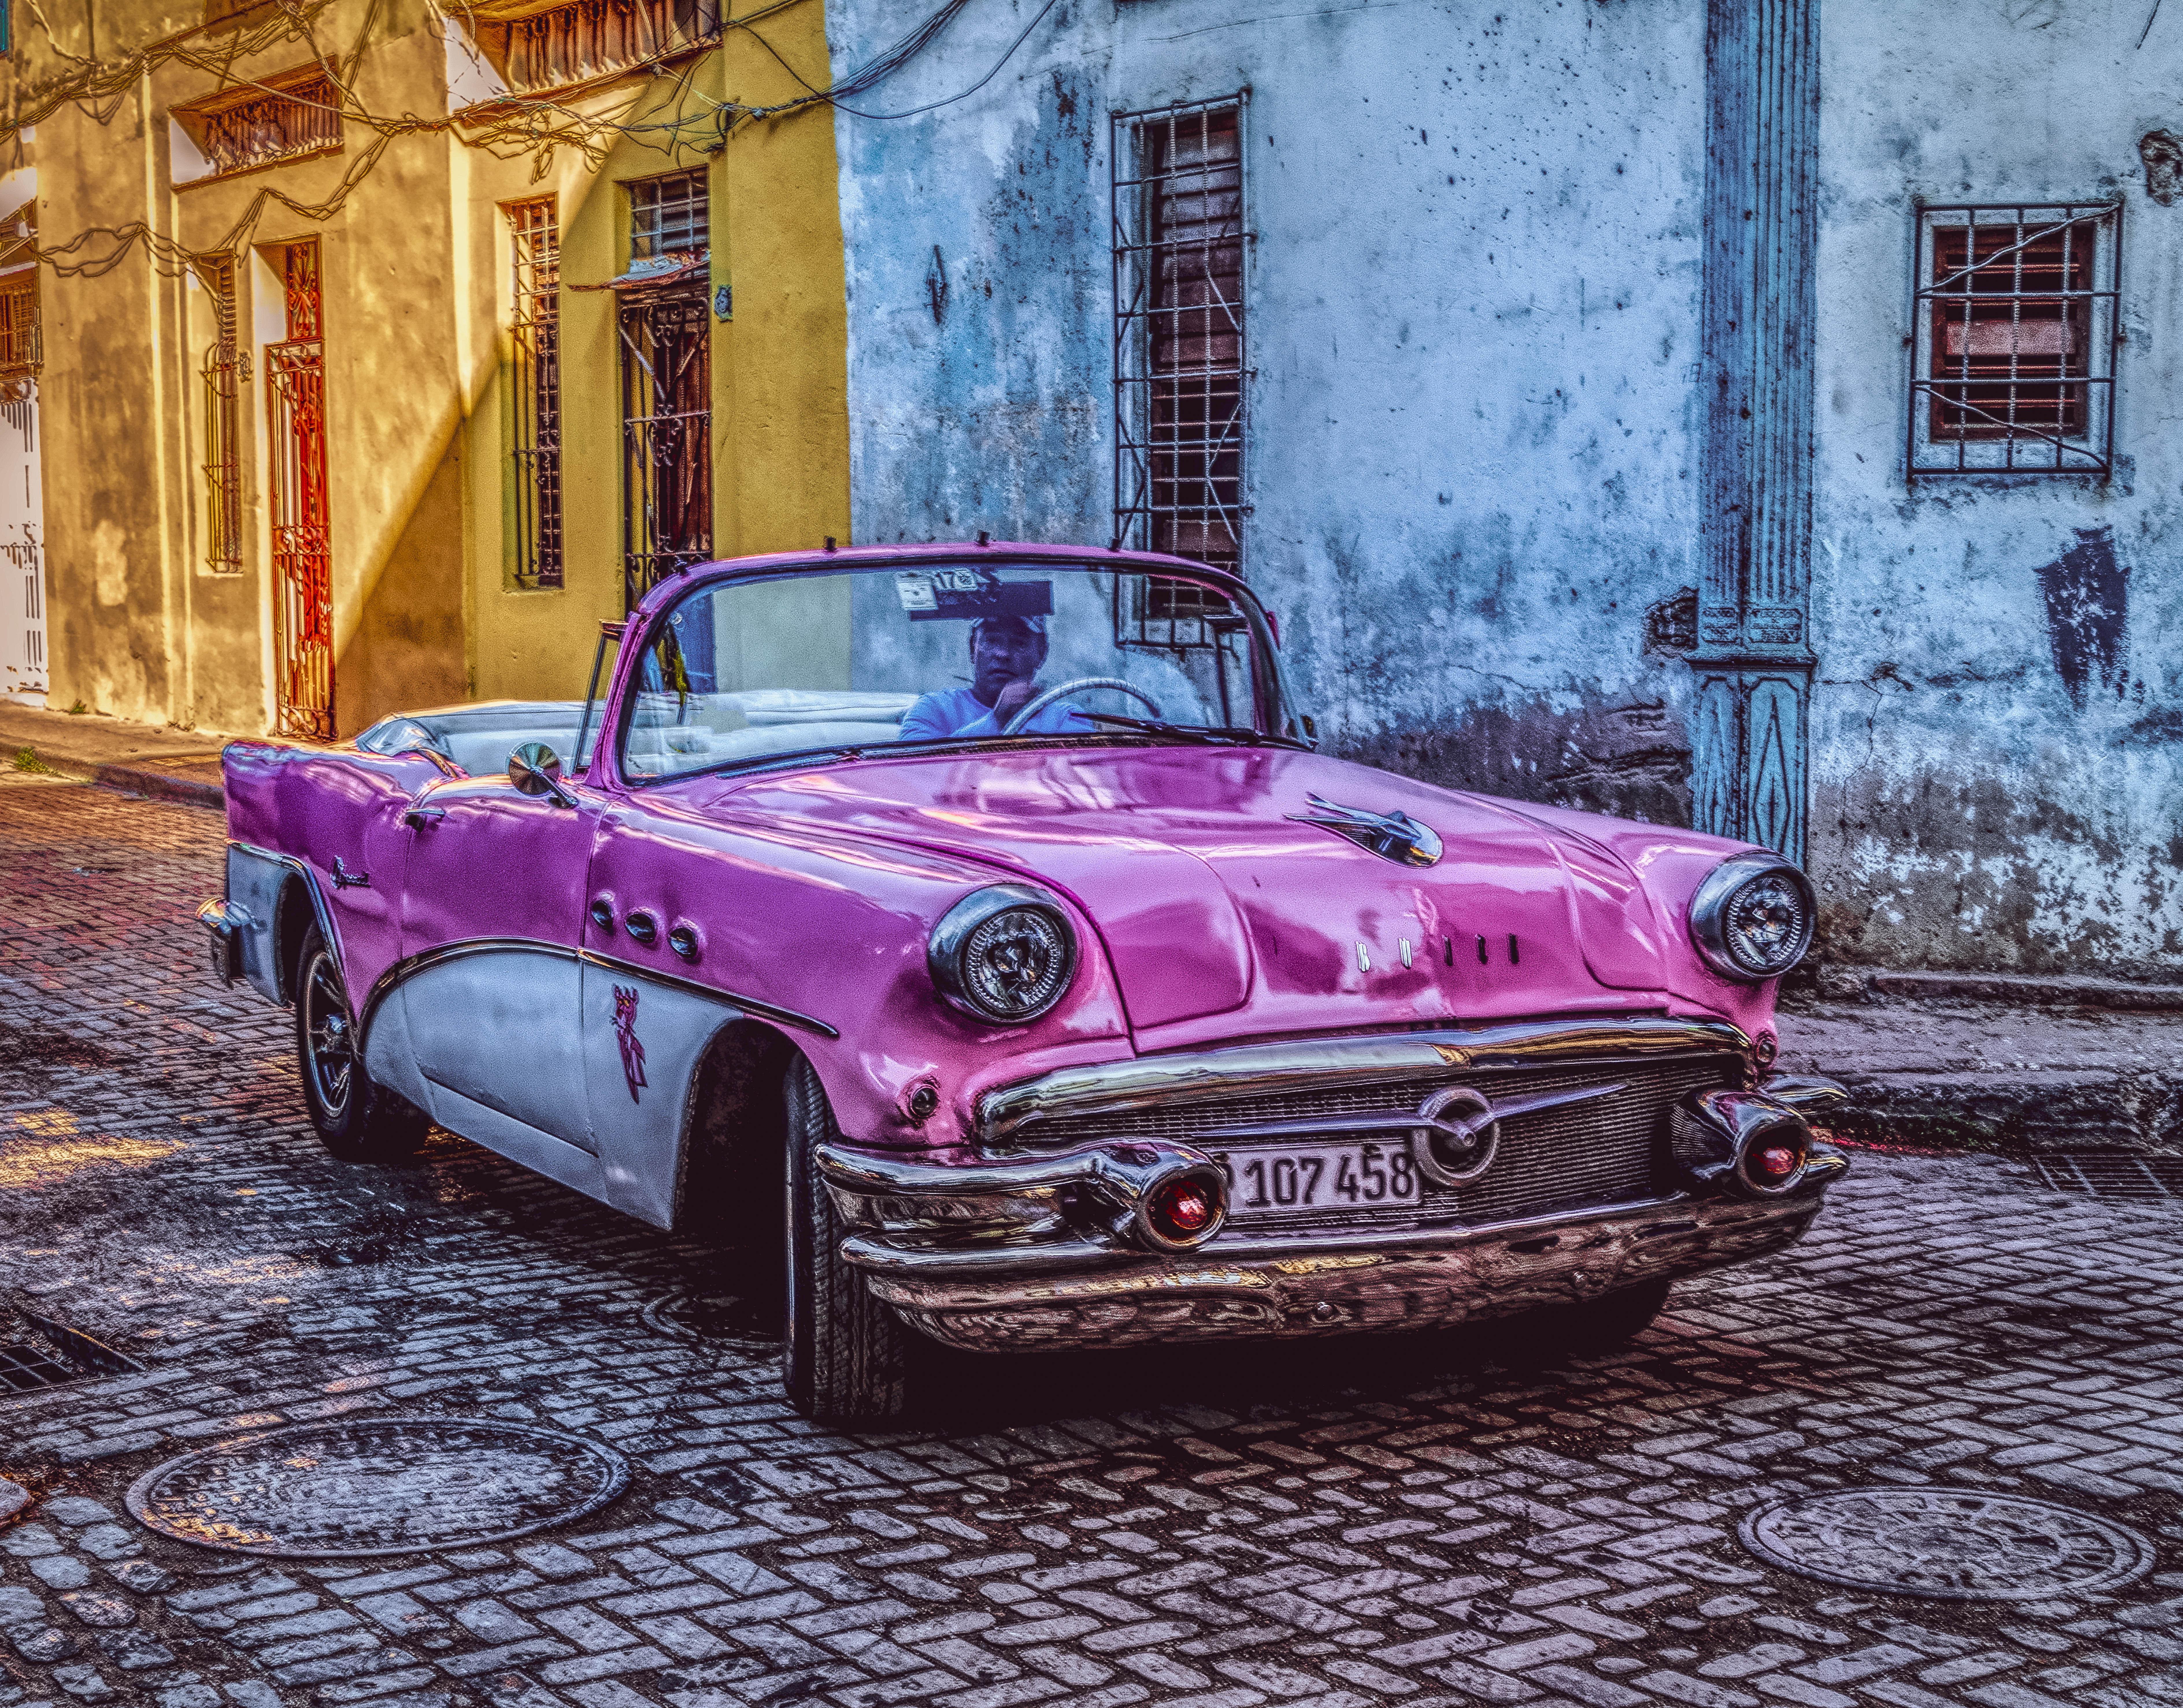 58156A - Pink Vintage 2